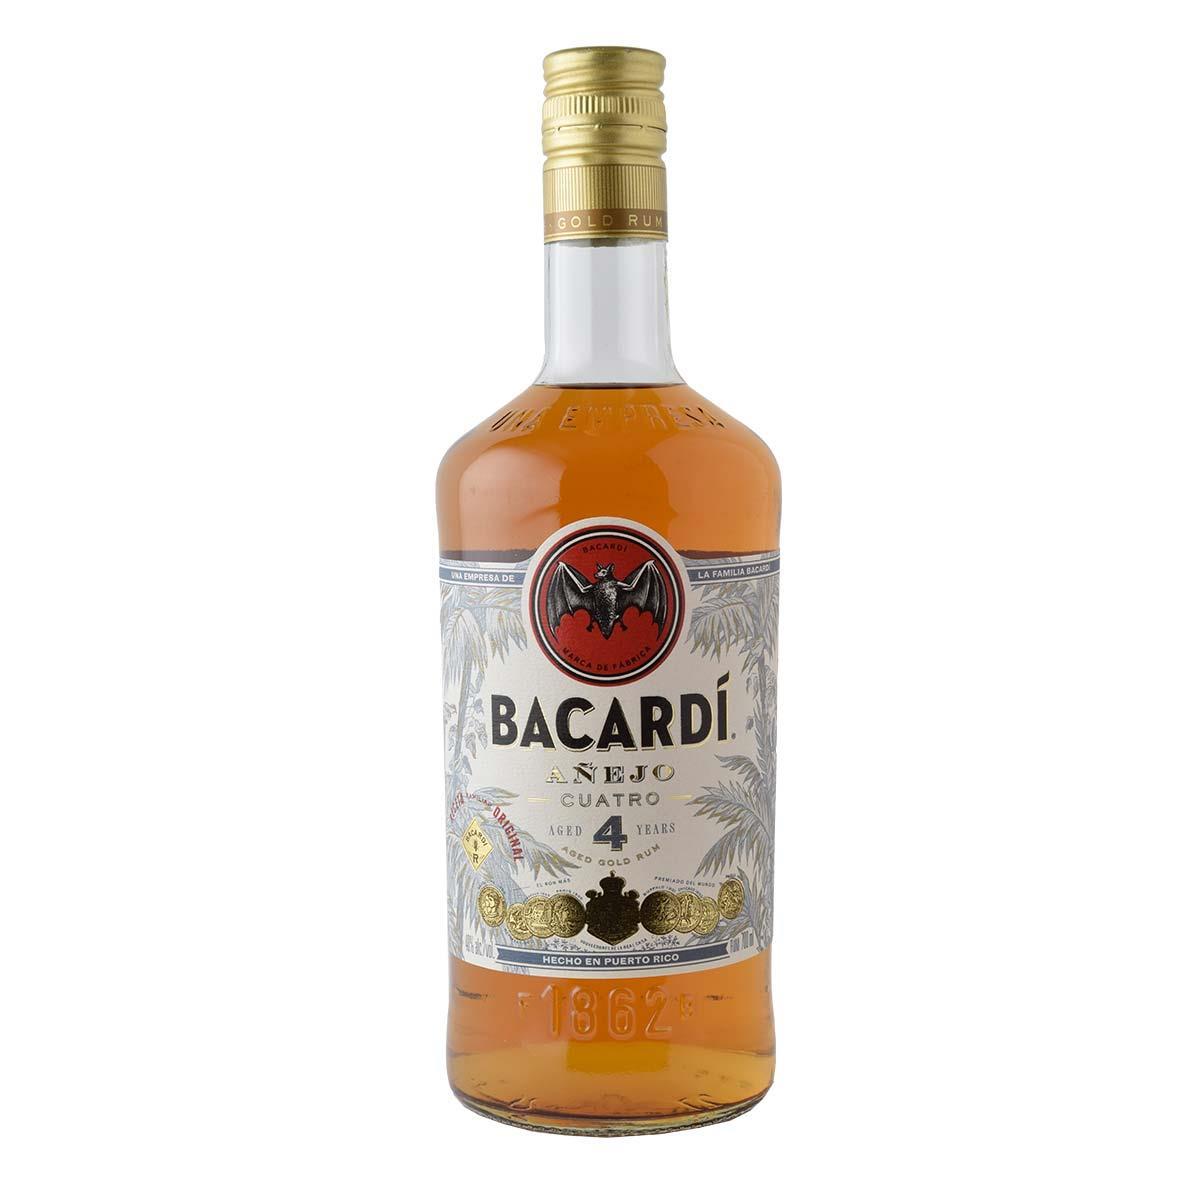 Bacardi Anejo Cuatro 4 y.o. Rum 700ml